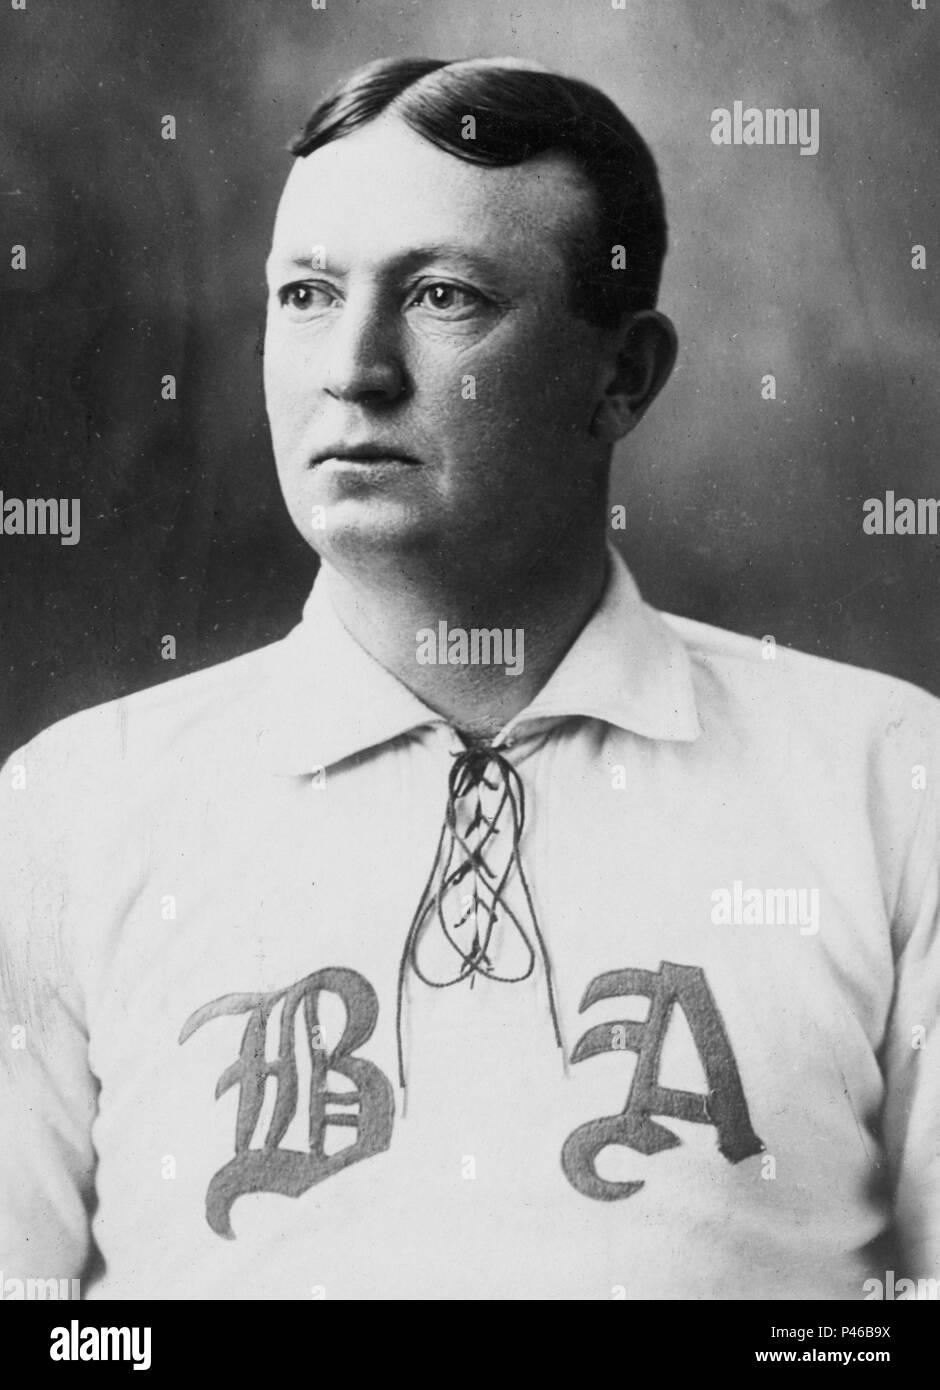 Denton True 'Cy' Young (1867 - 1955), joueur américain de basket-ball américain Photo Stock